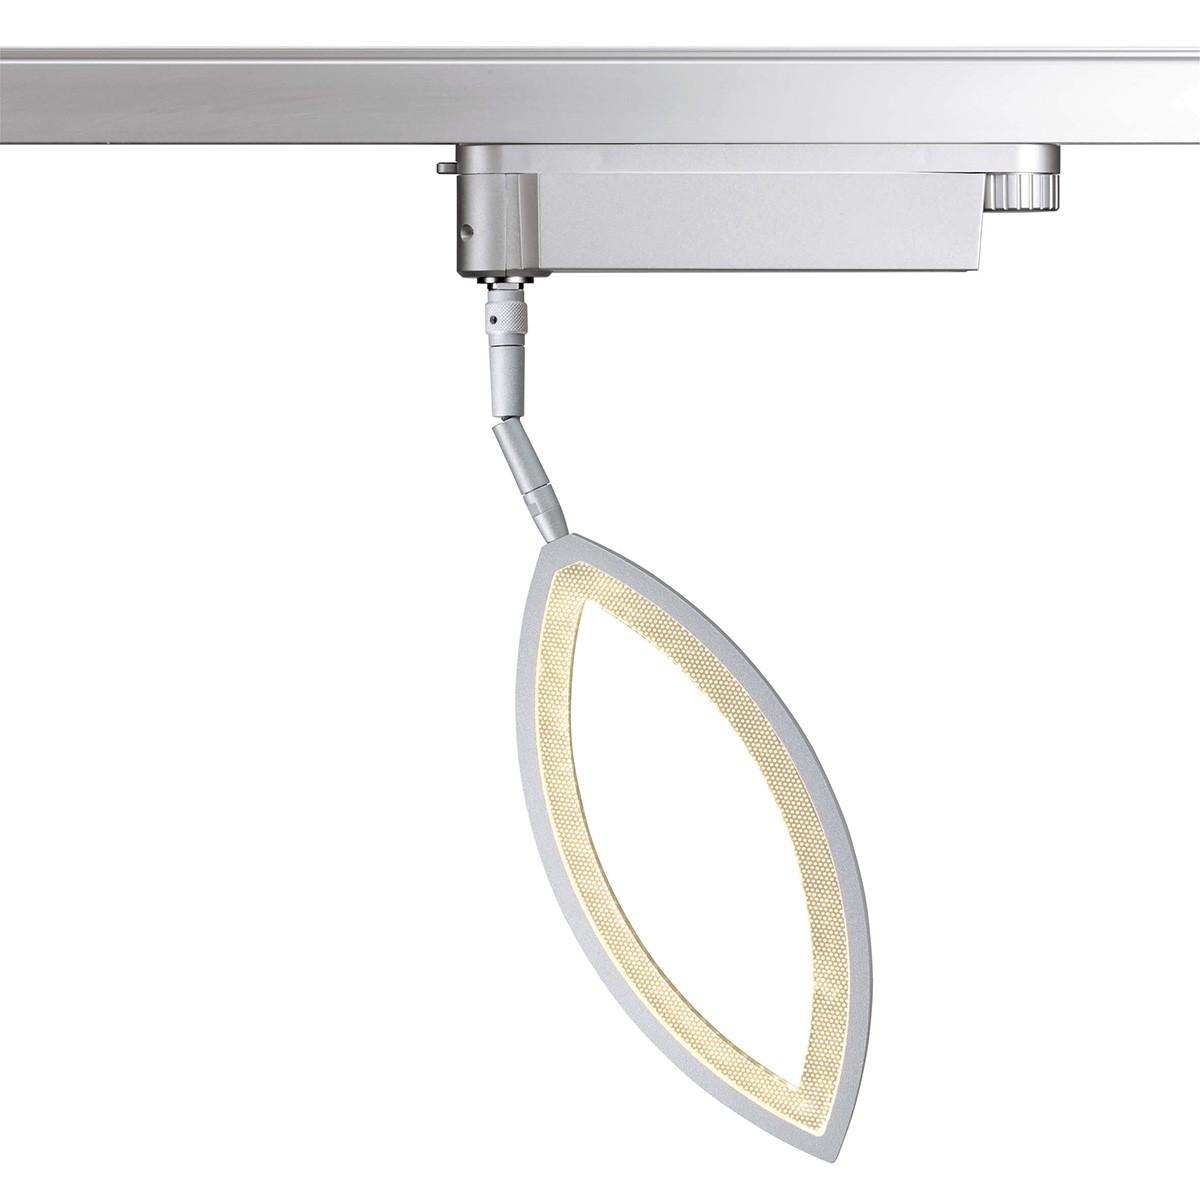 Oligo PHASE Flavia LED Strahler, 2700 K, Prismatik offen, Chrom matt